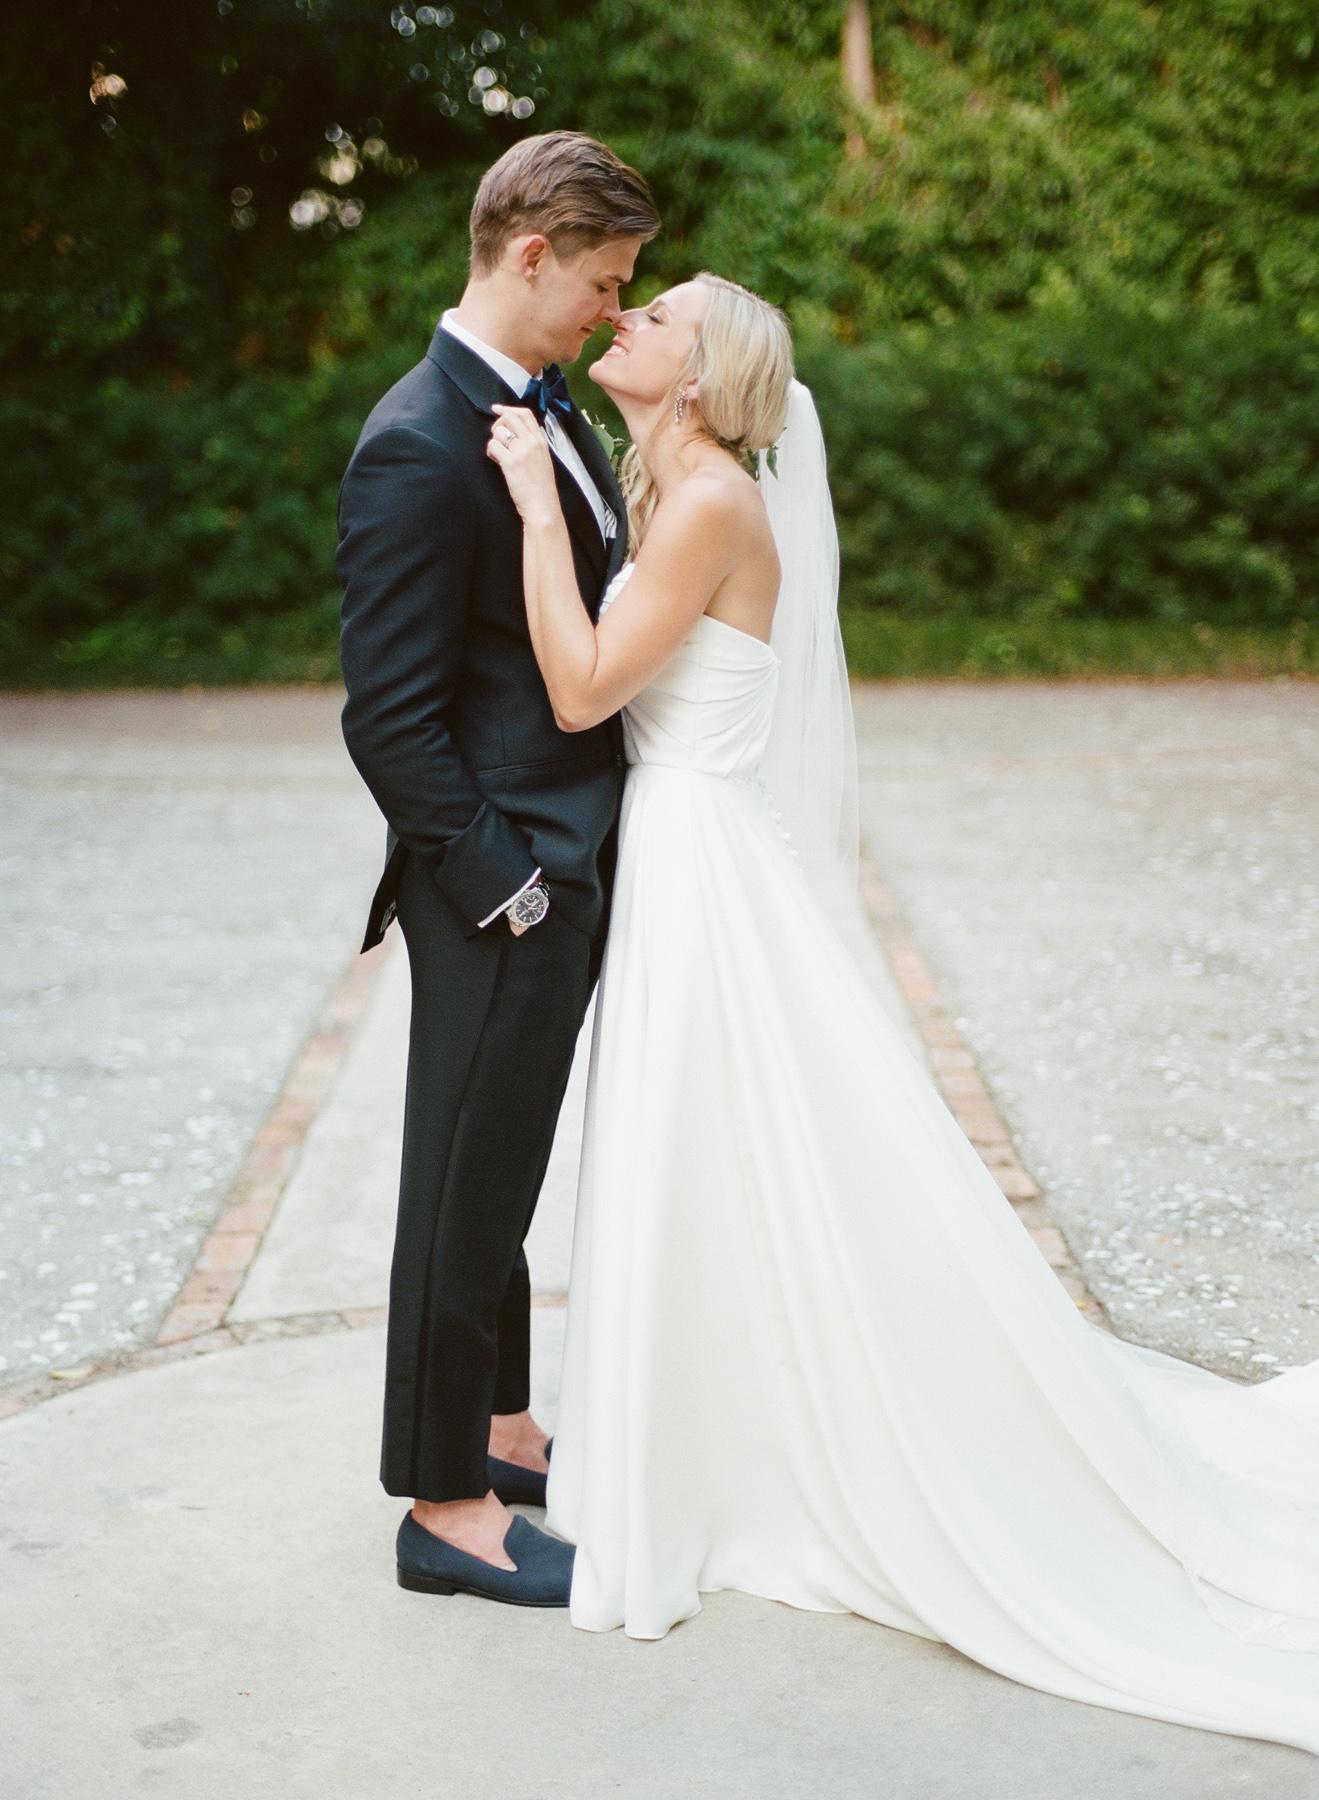 NC-wedding-venues-film-photographer-30.jpg